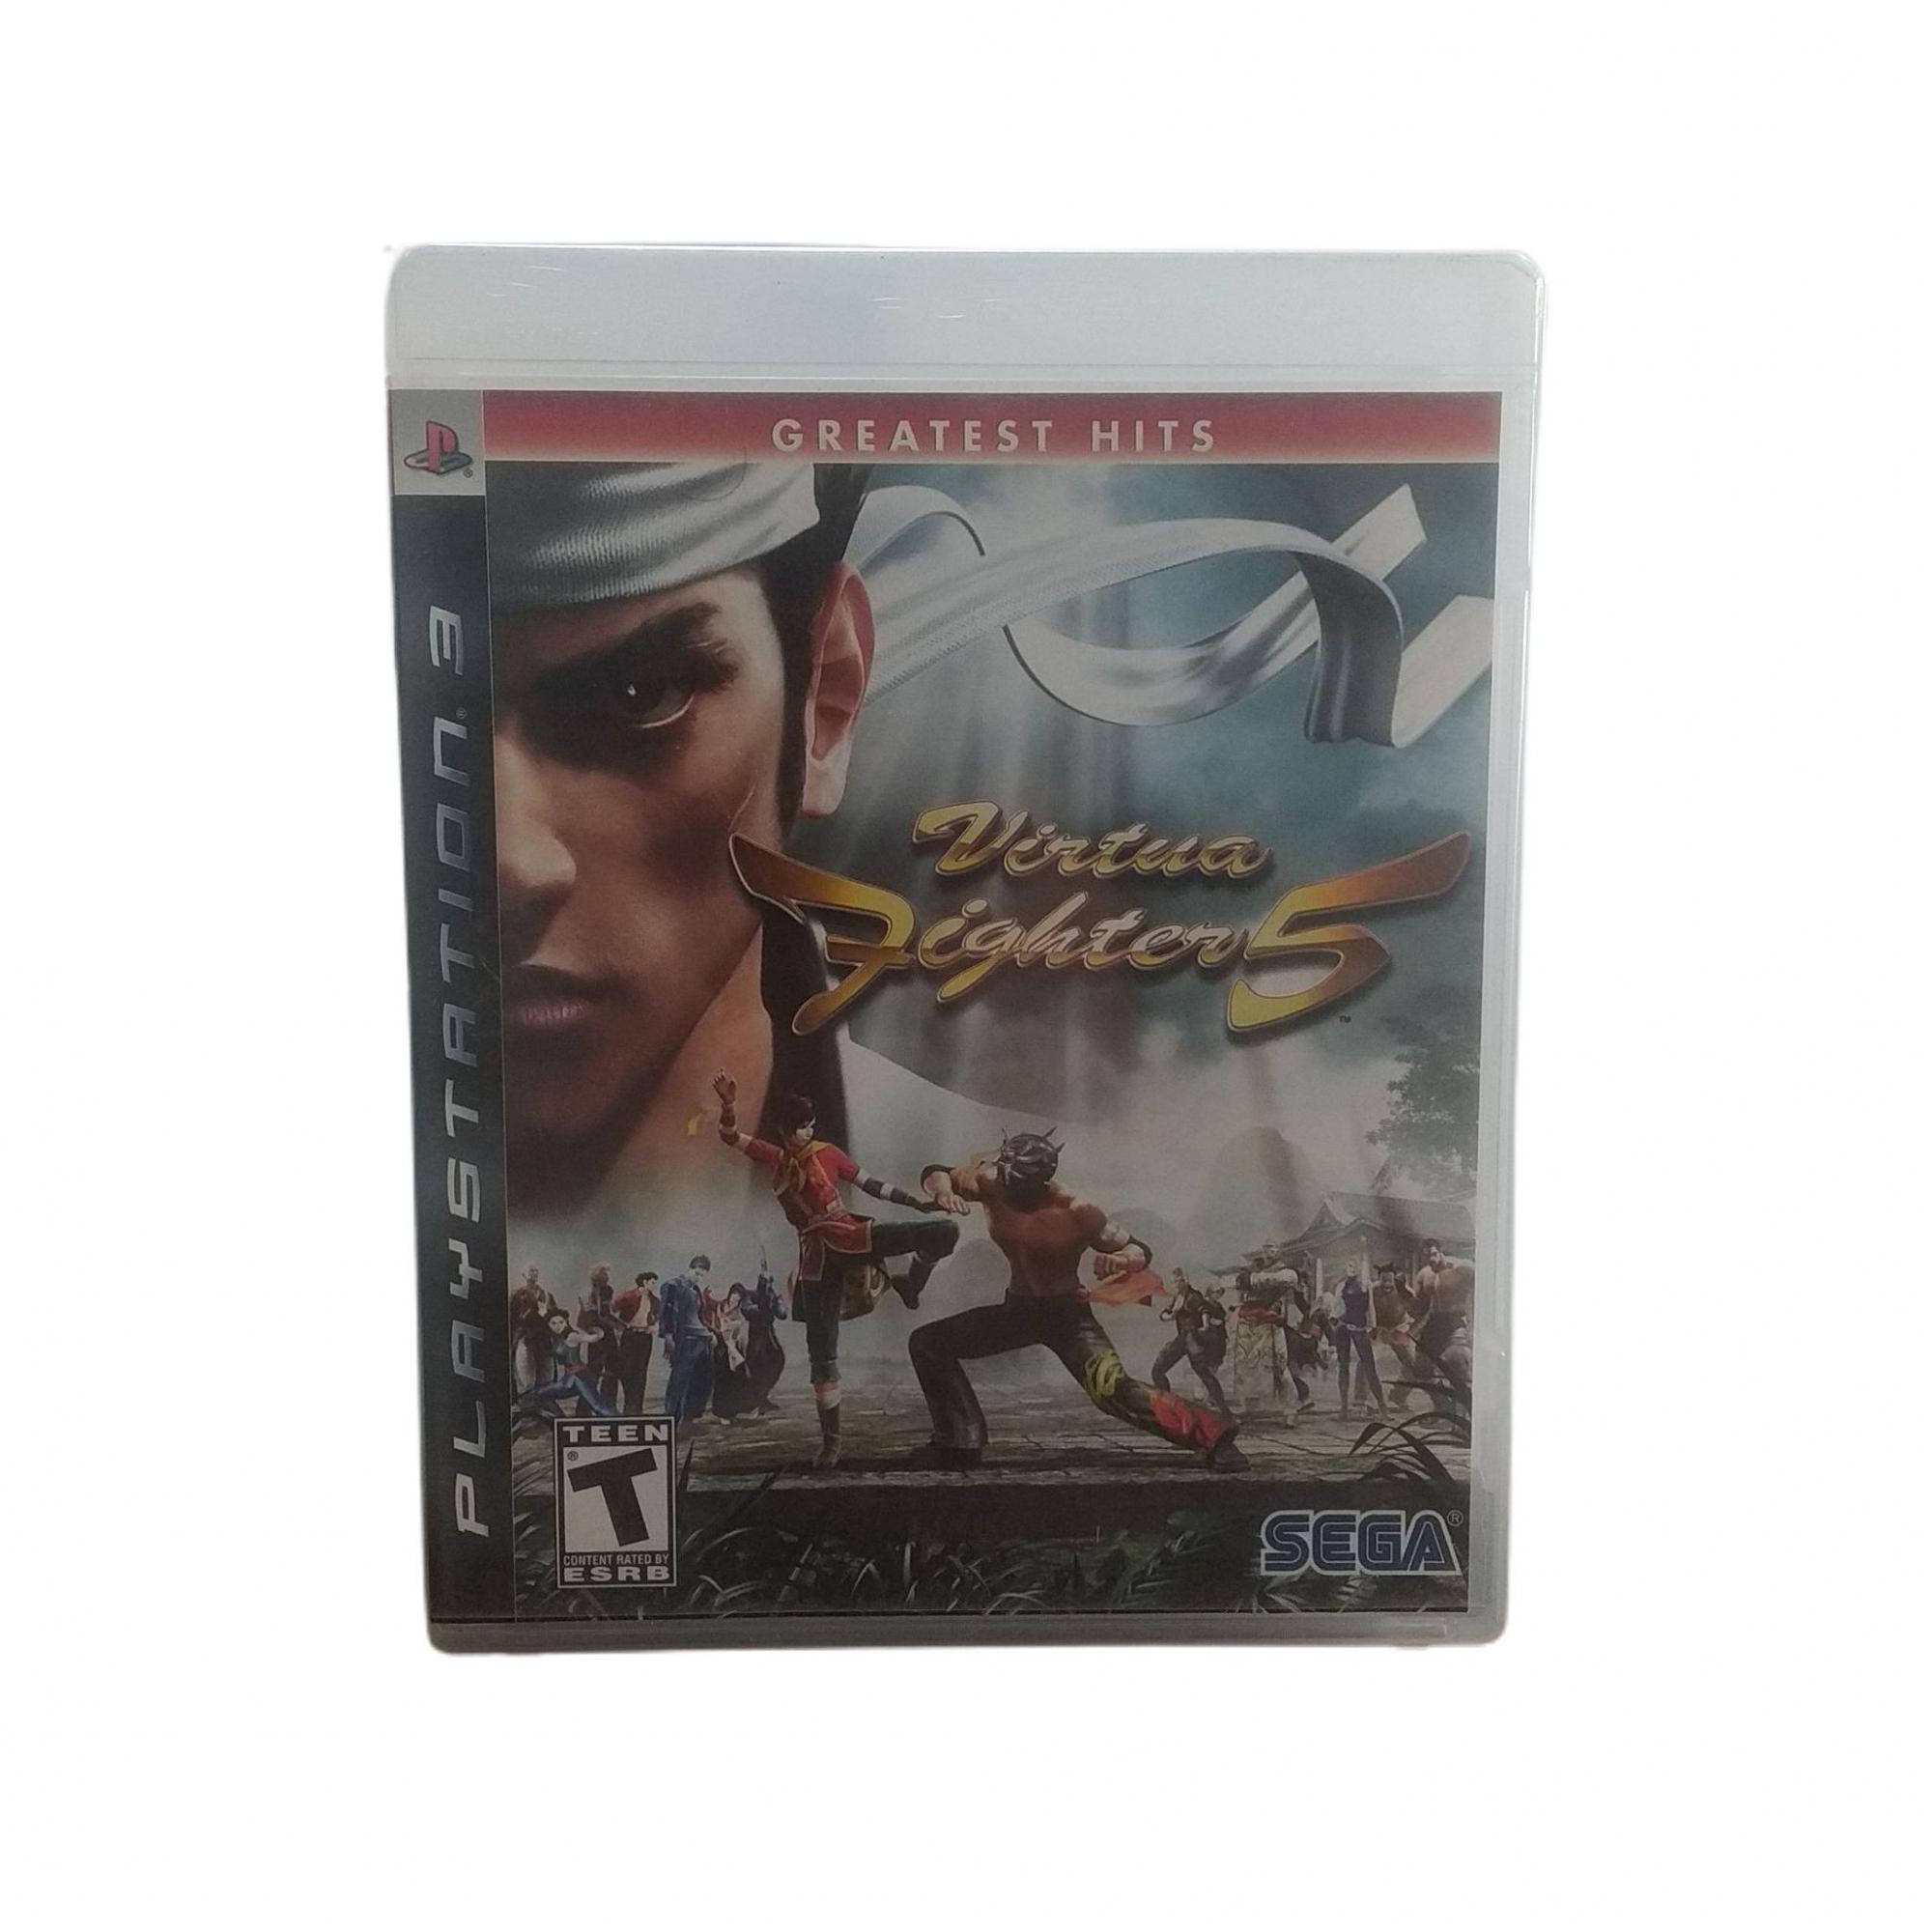 Virtua Fighter 5 Greatest Hits (Seminovo) - Ps3